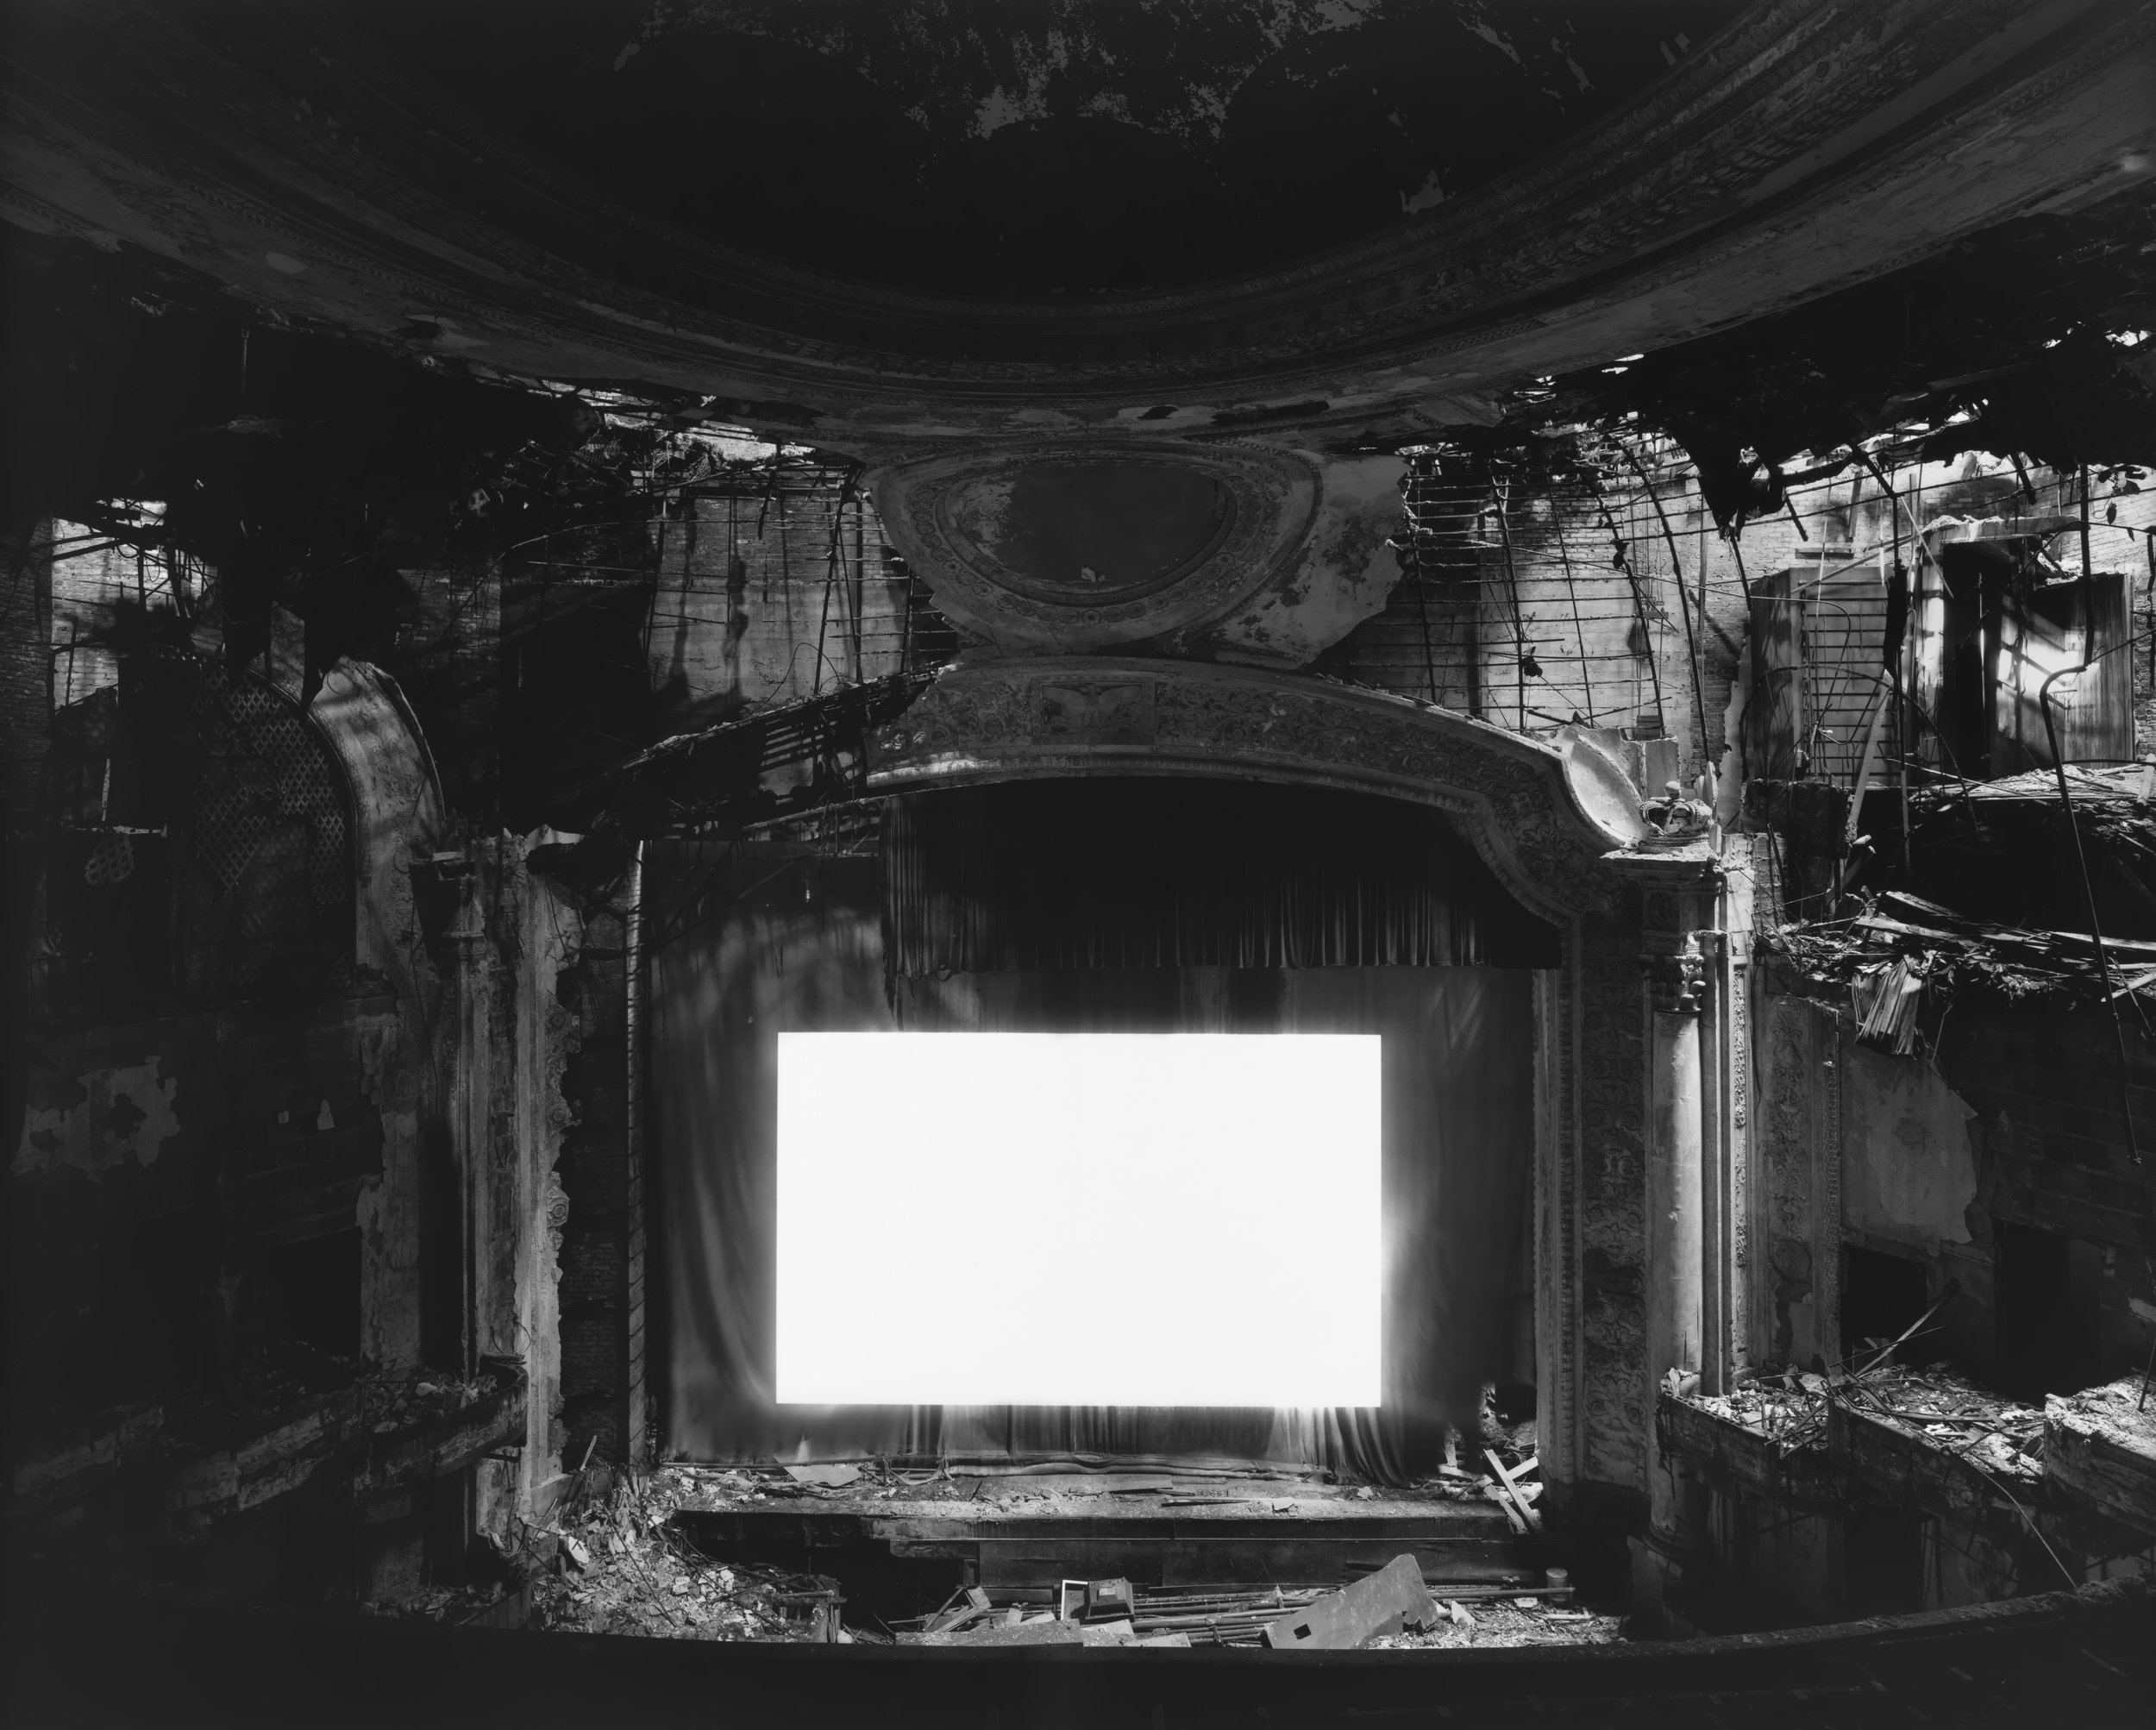 © Theaters  by Hiroshi Sugimoto, Paramount Theater, Newark, 2015.